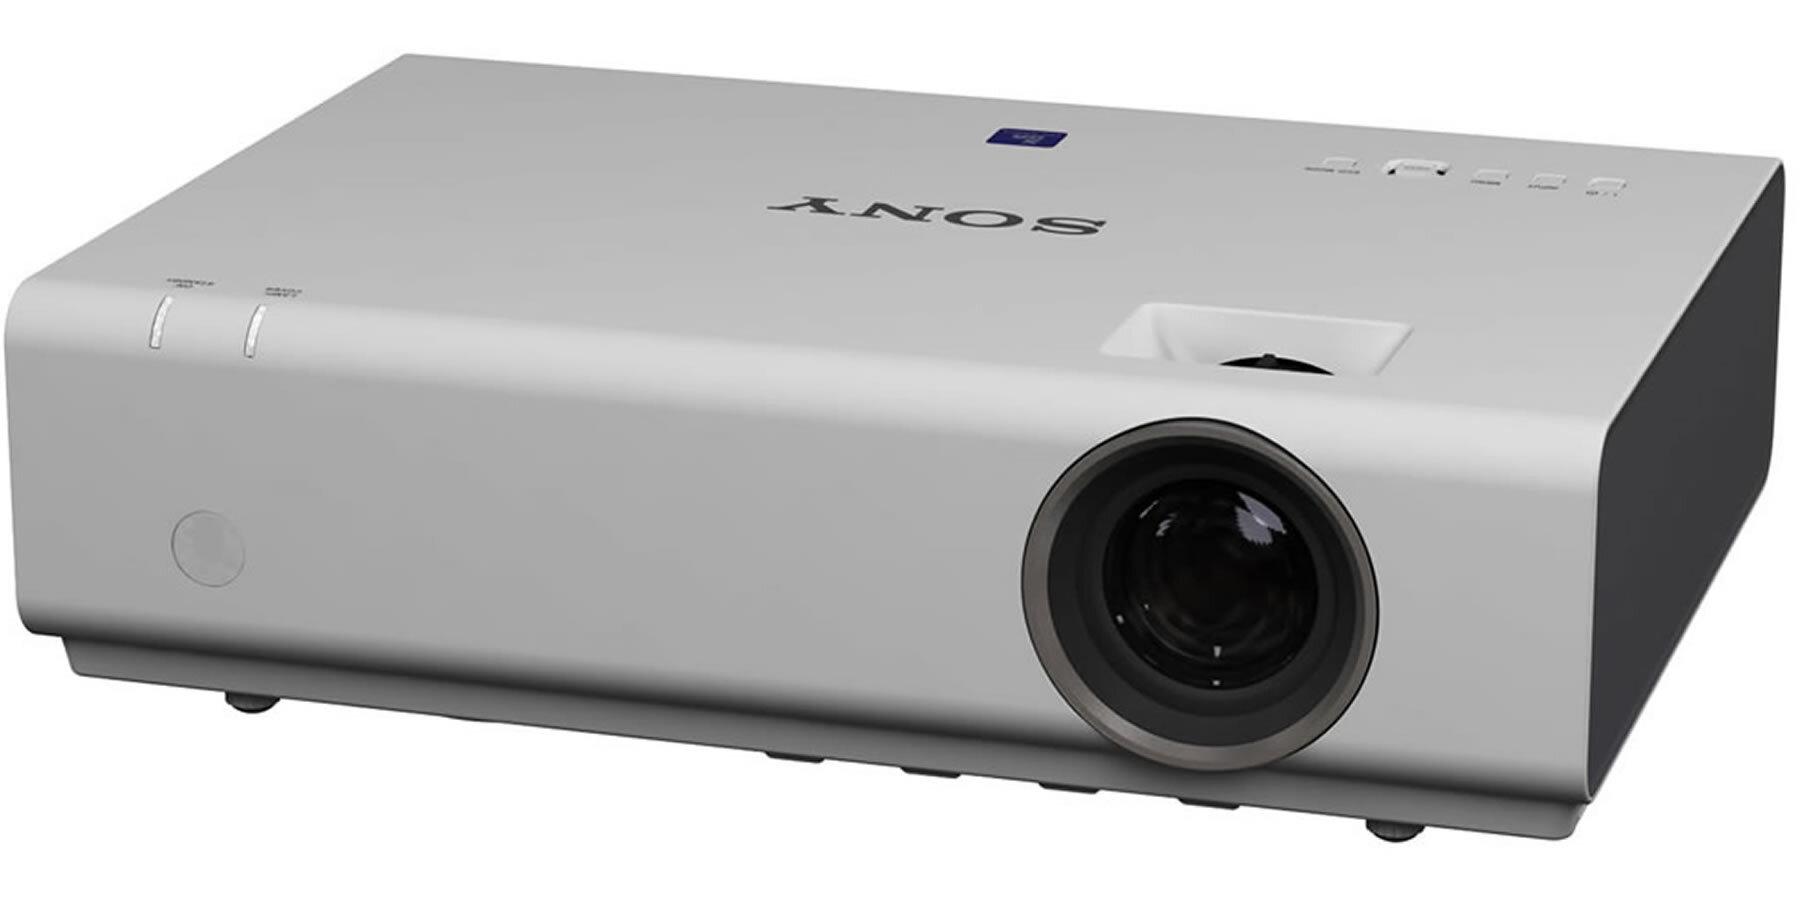 Máy chiếu Sony VPL-EX276 (EX-276) - 3700 lumens